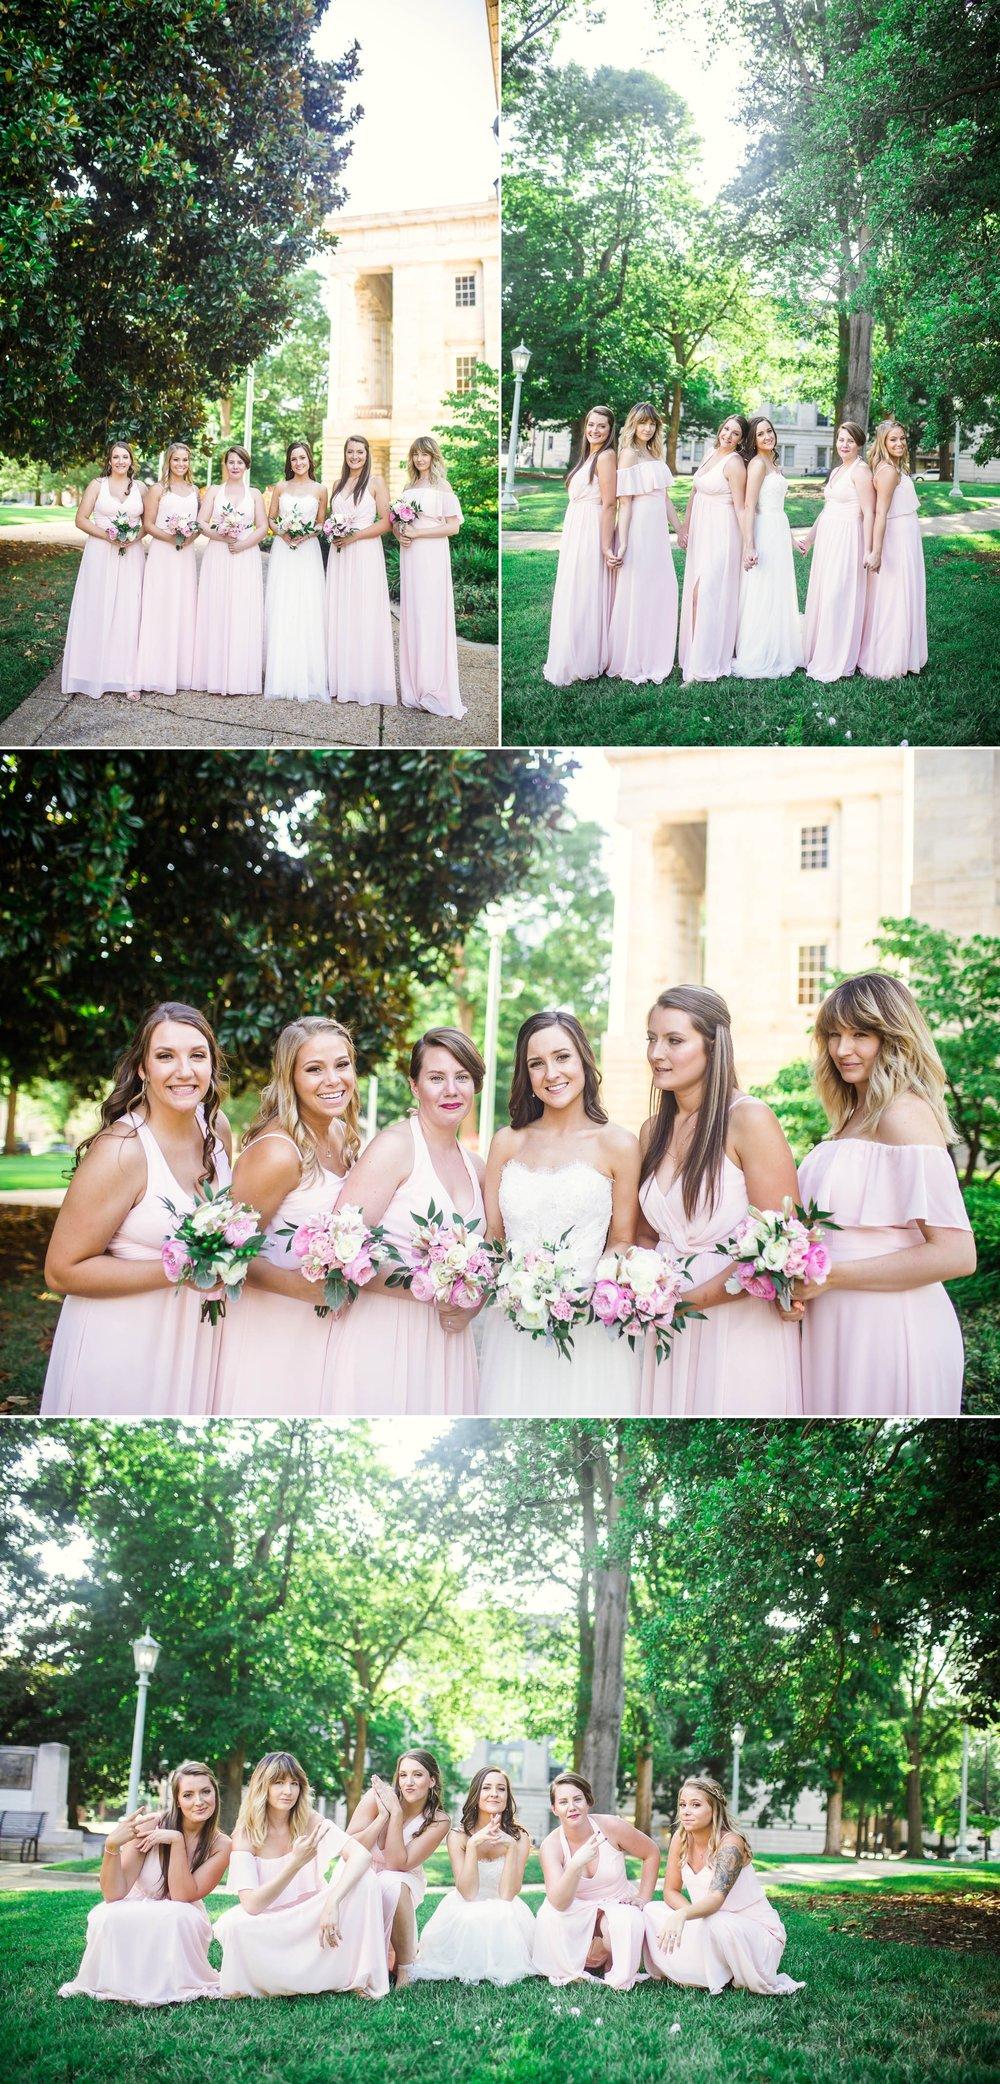 Elizabeth + Kane - Wedding at the Stockroom at 230 - Raleigh North Carolina Wedding Photographer 11.jpg